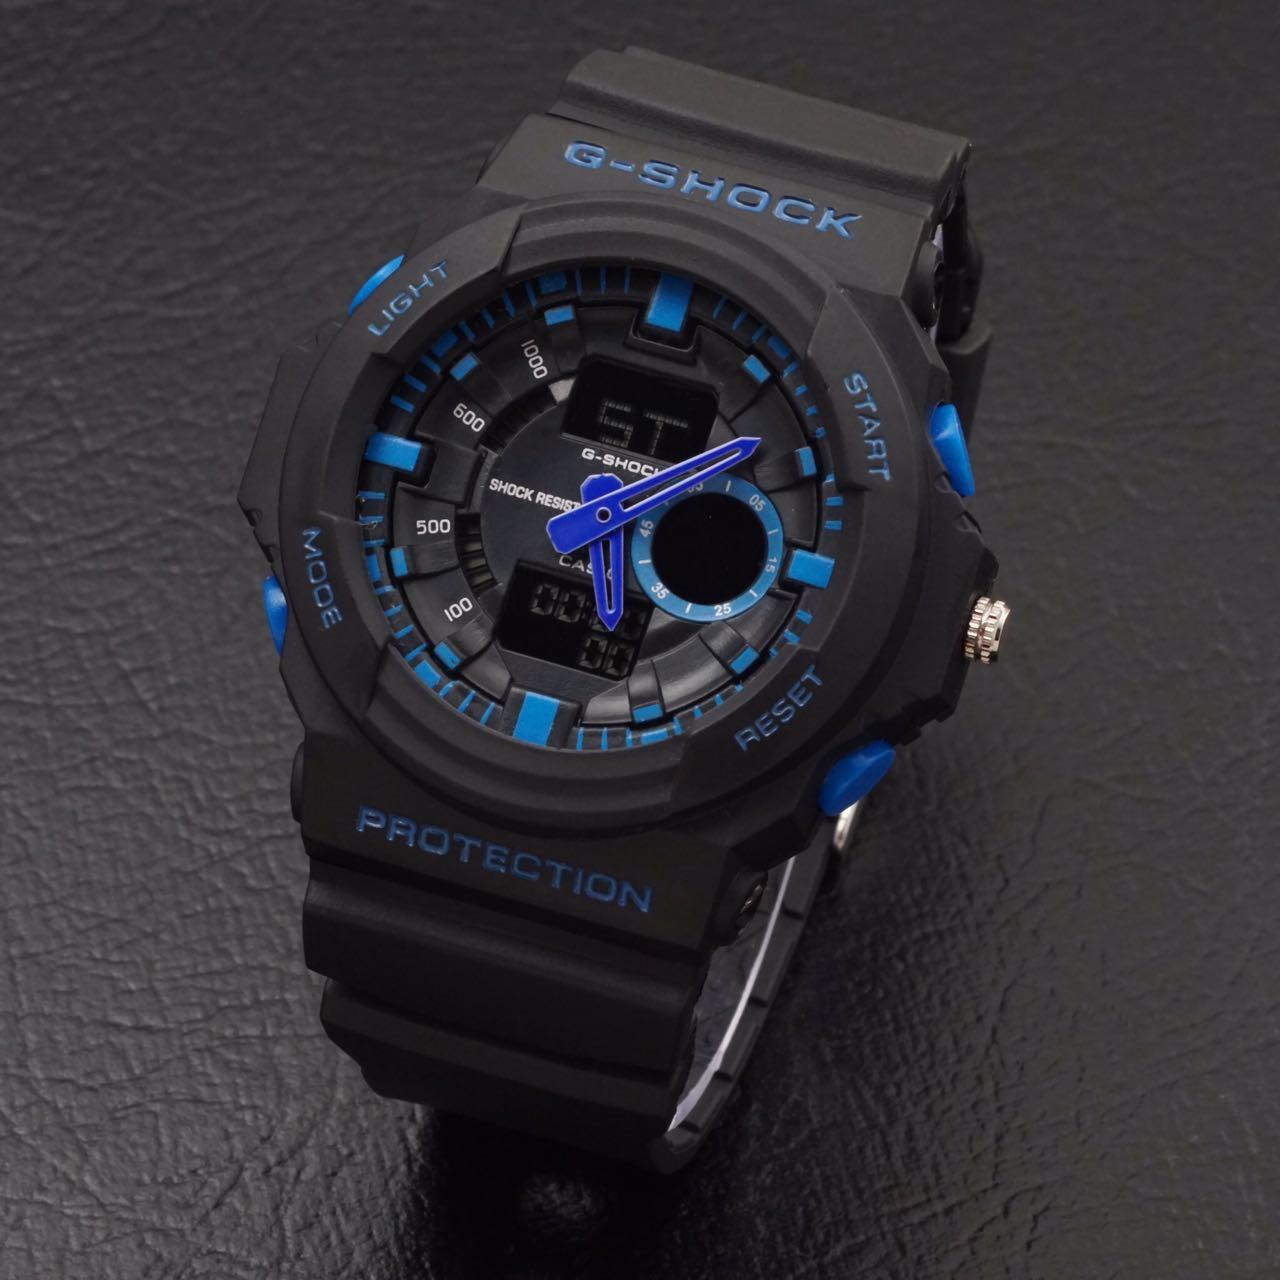 jam tangan gshock ga150 g shock ga 150 lis biru double time analog dan